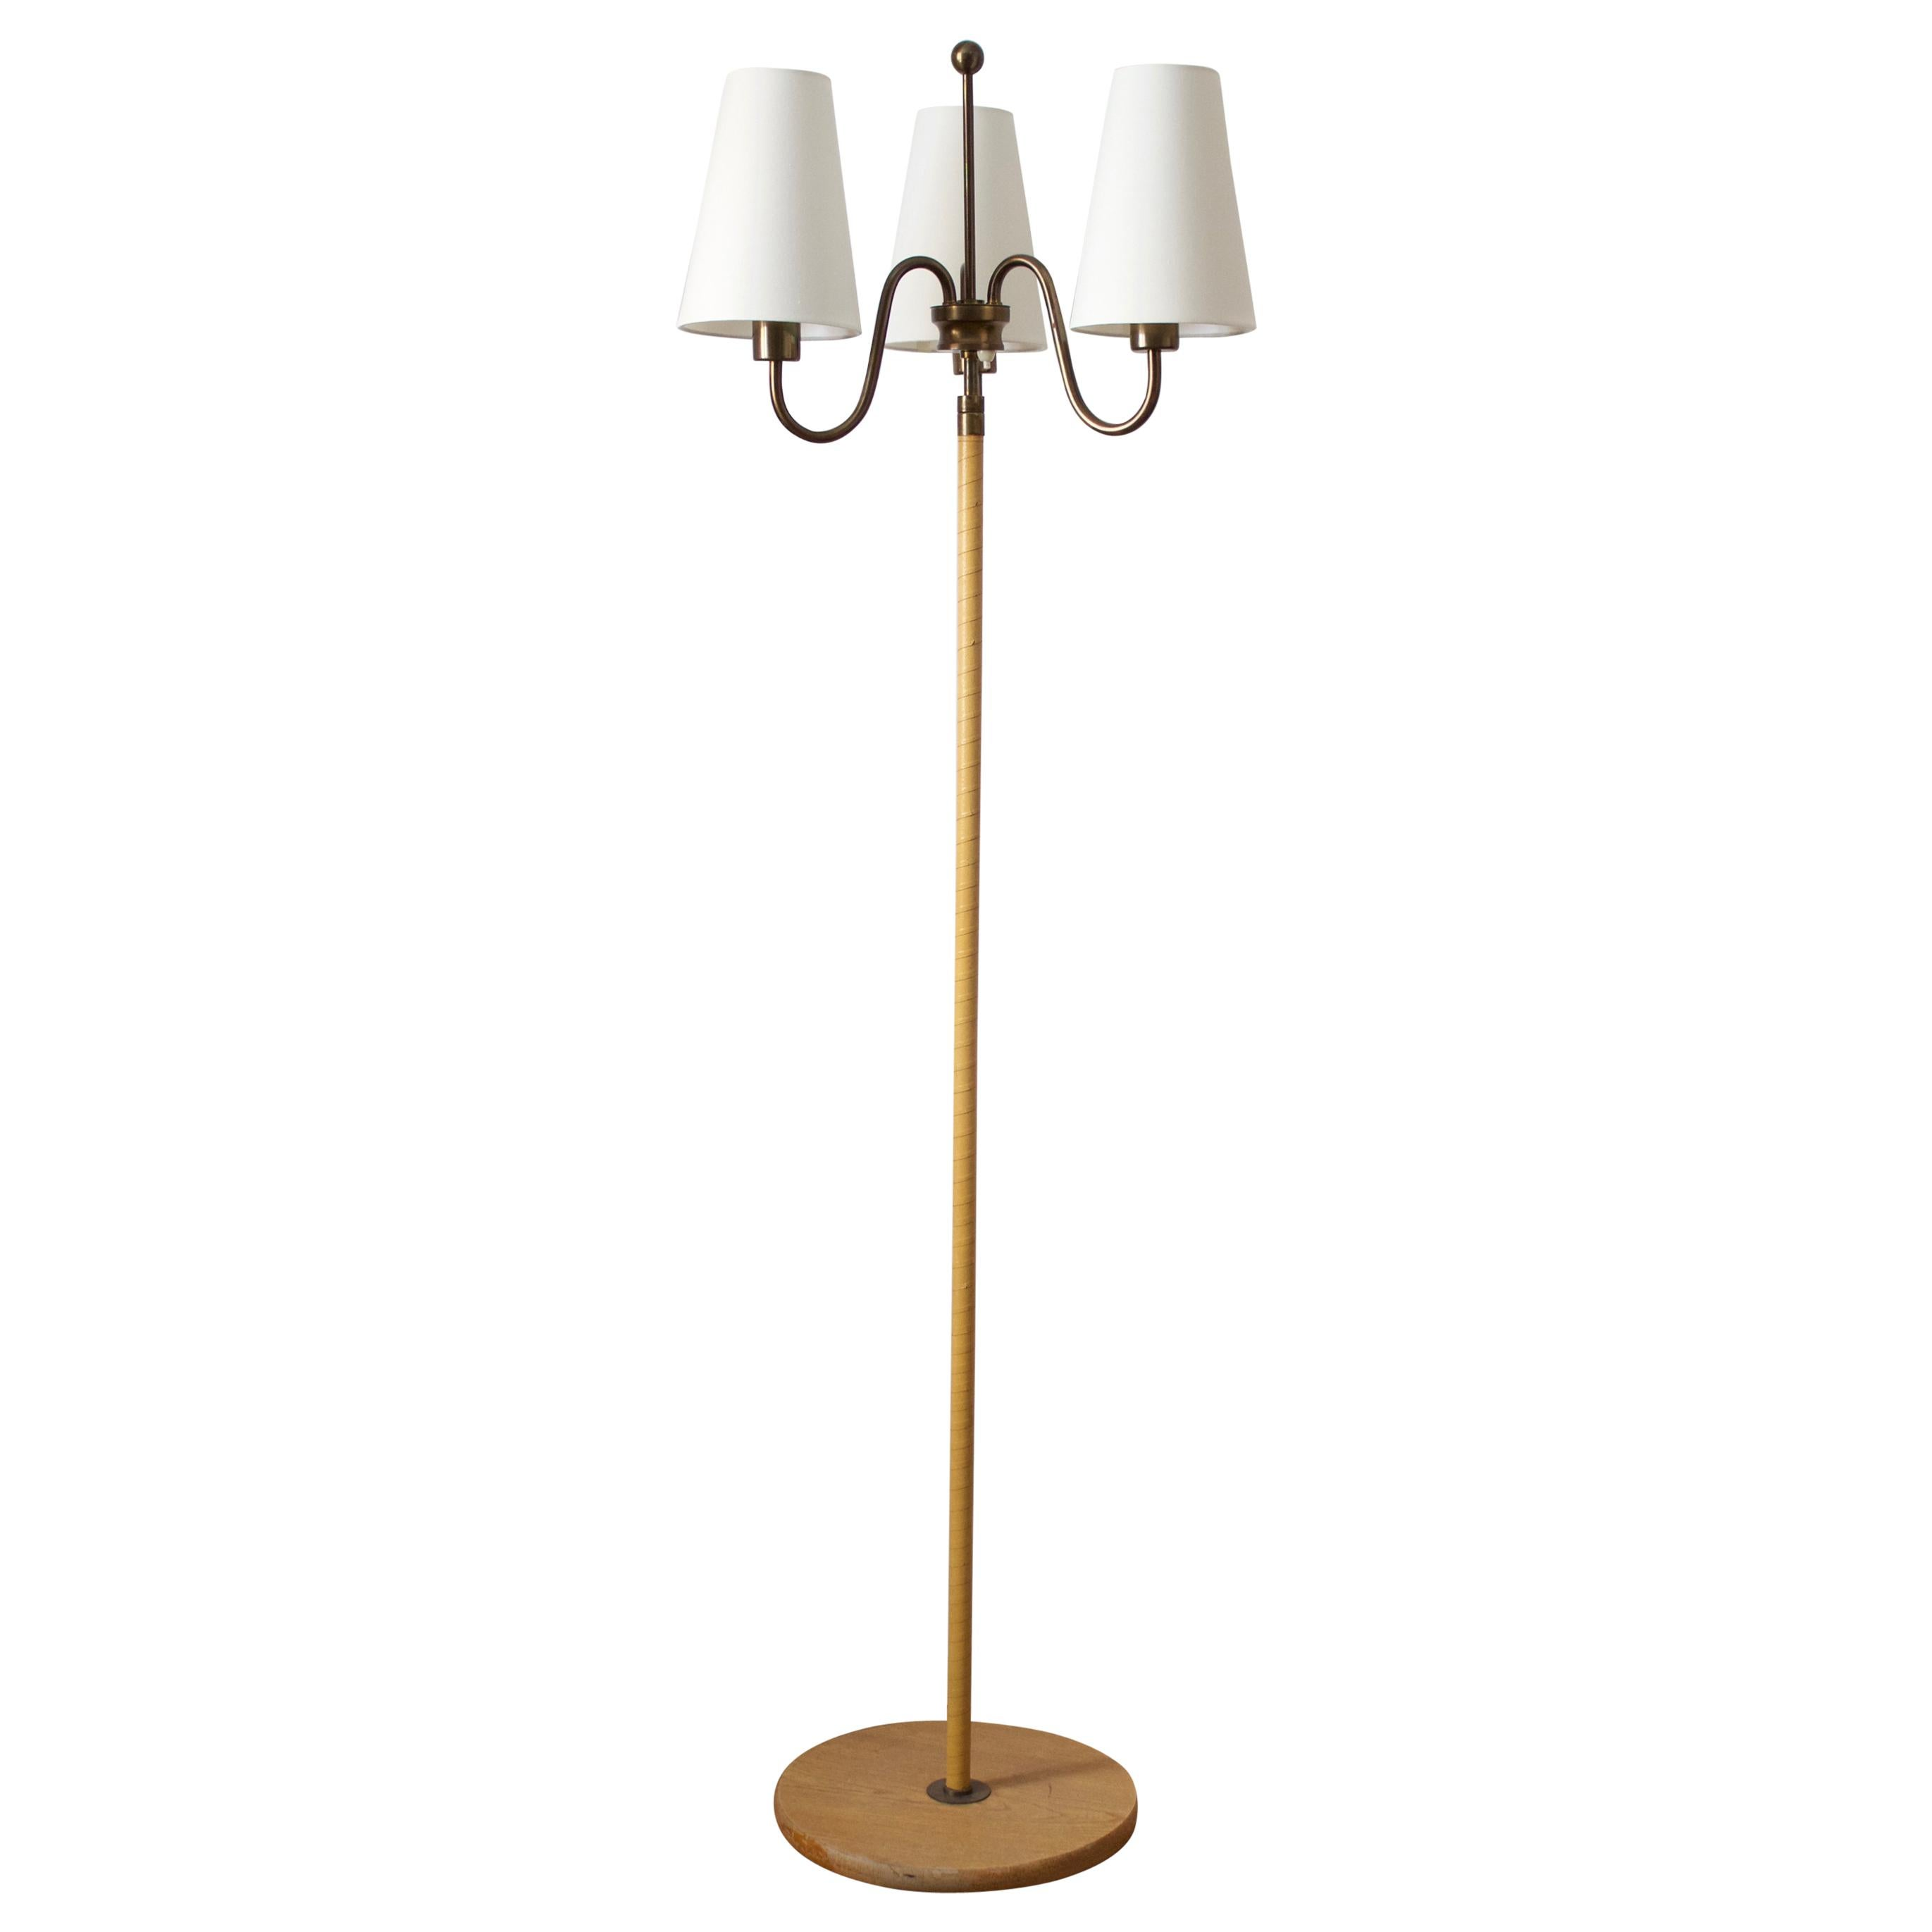 Swedish, Three-Armed Floor Lamp, Brass, Leather, Oak, Fabric, Sweden, 1940s